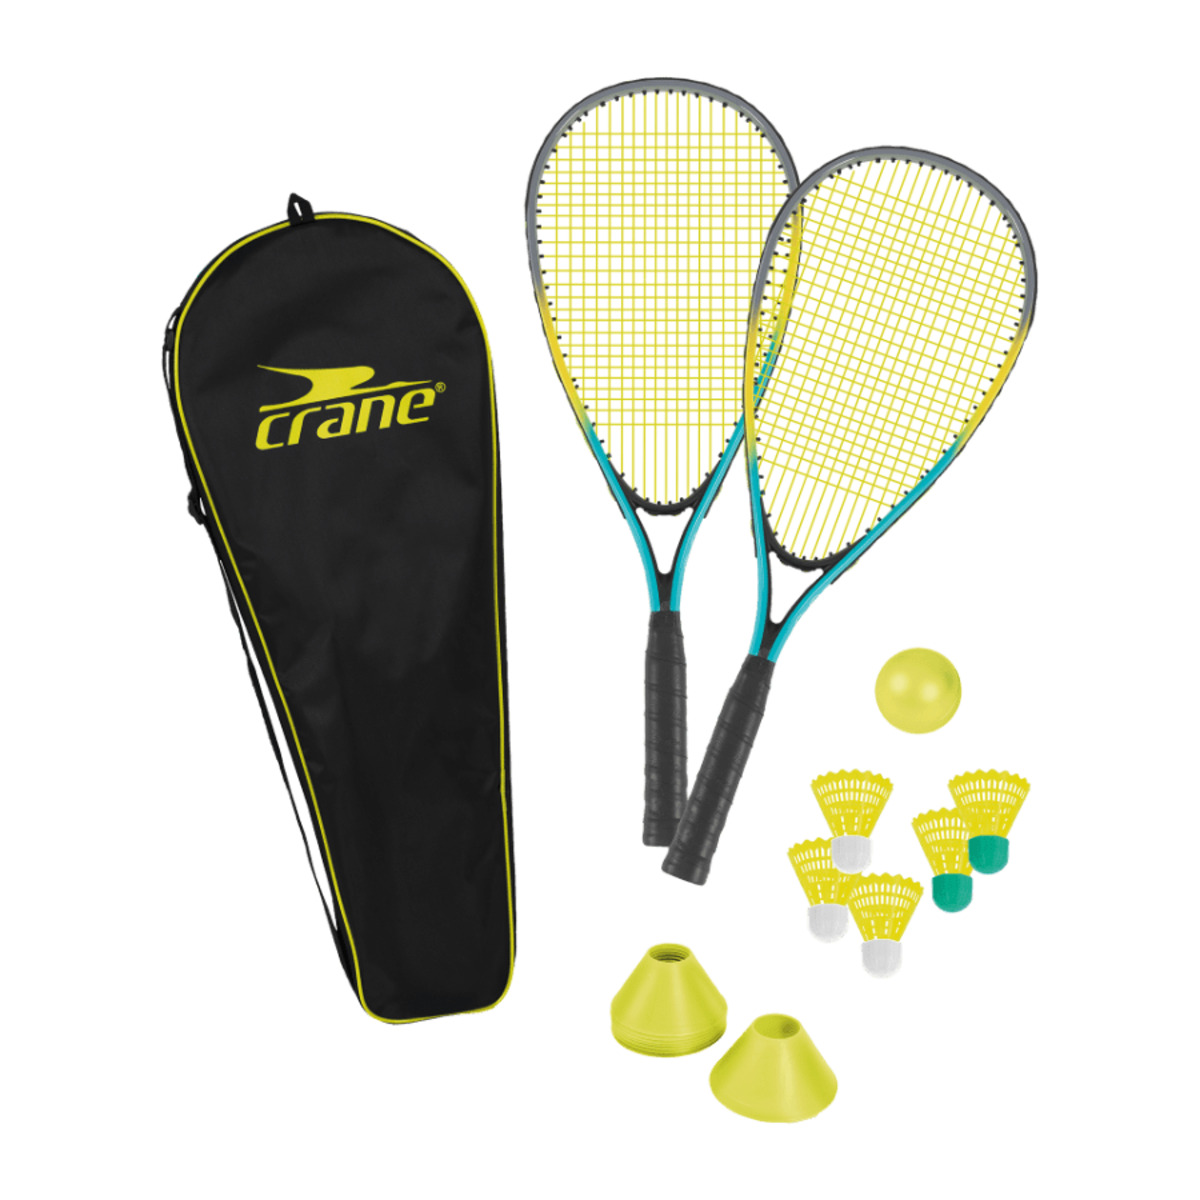 Bild 2 von CRANE     Turbo-Badminton-Set